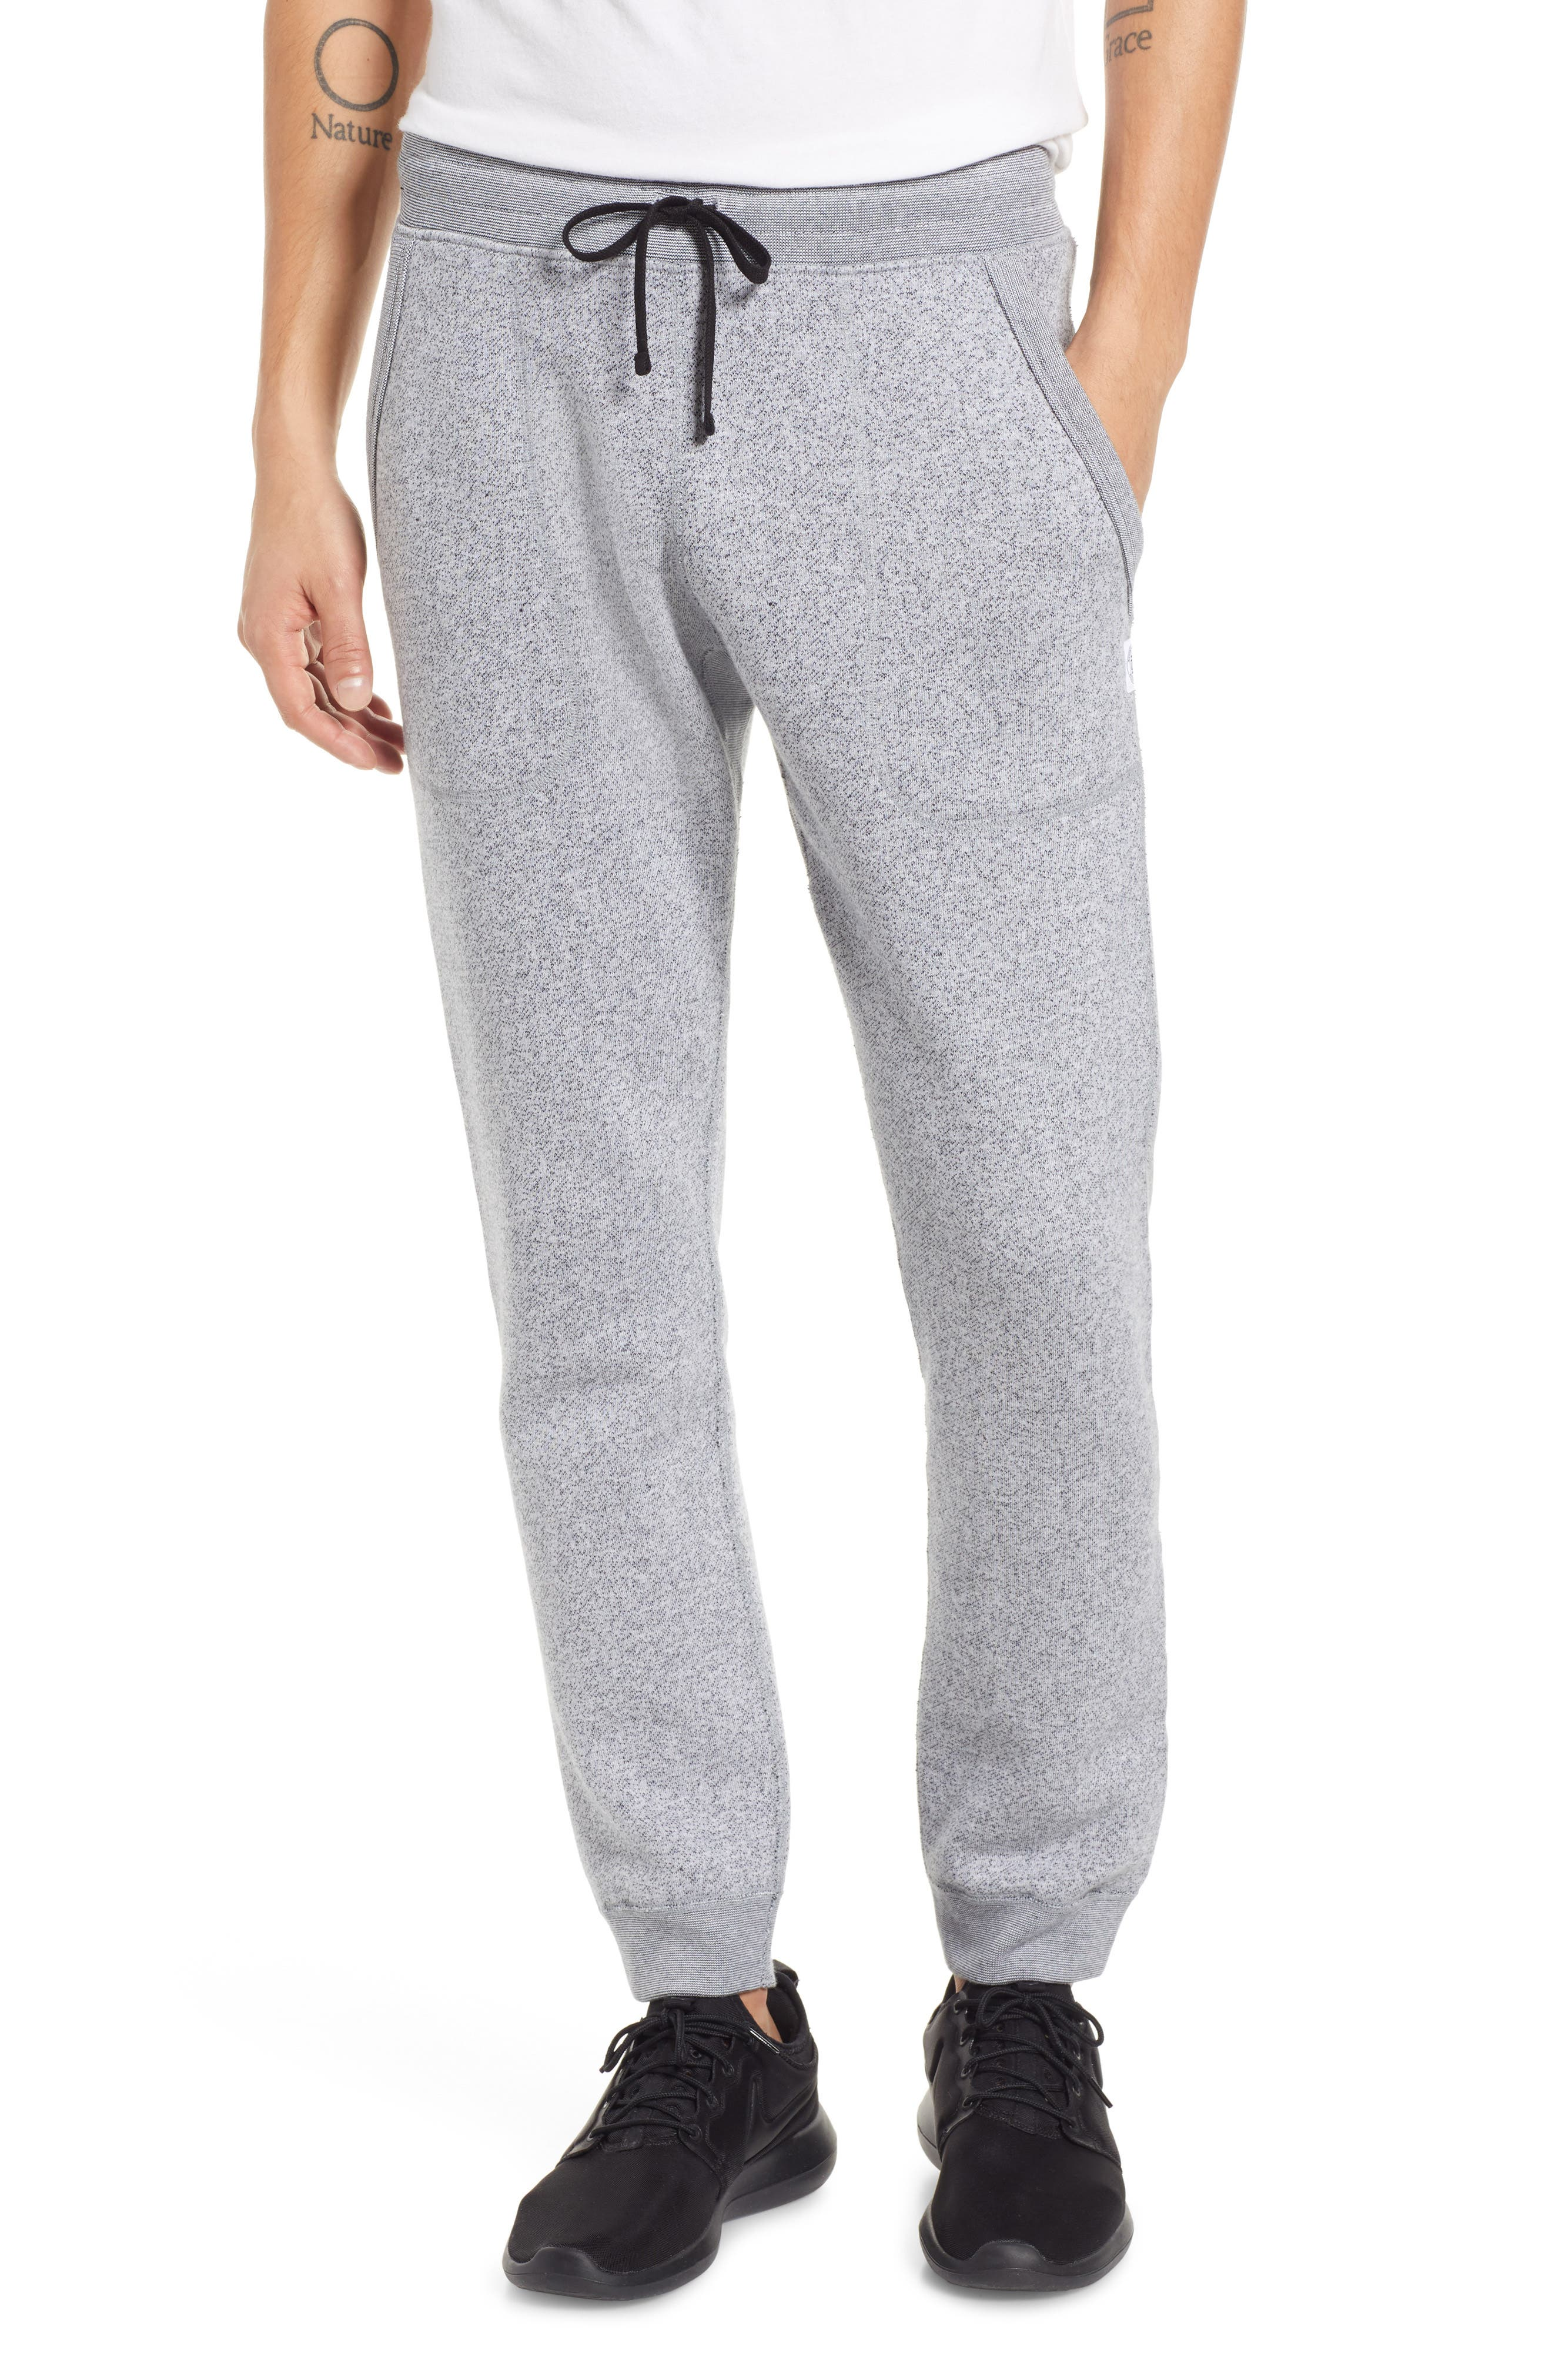 Tiger Slim Jogger Sweatpants,                         Main,                         color, WHITE